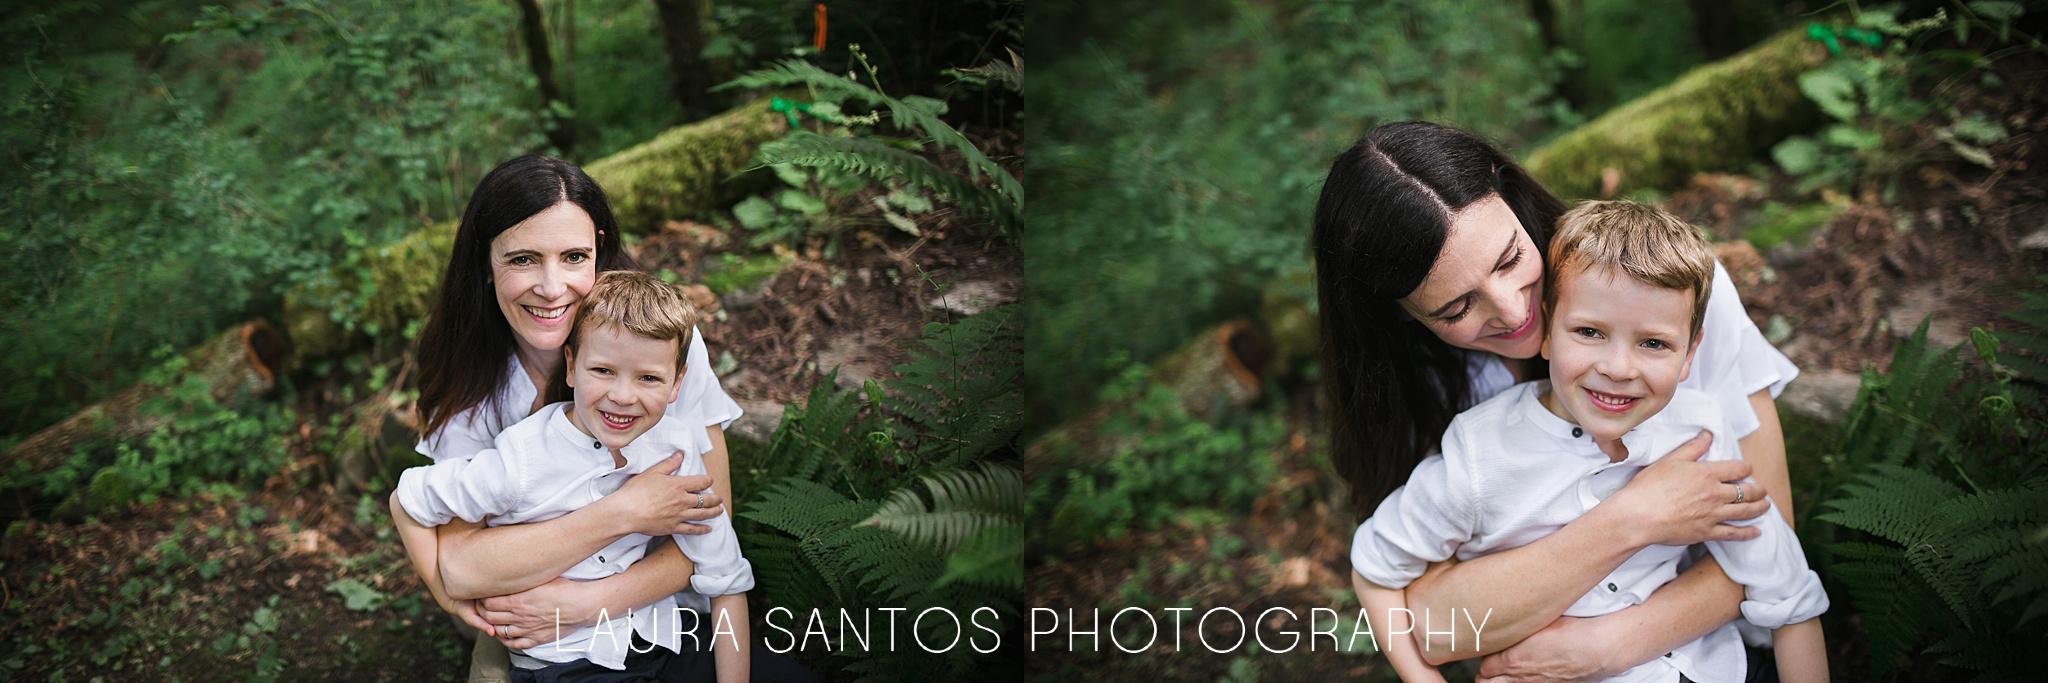 Laura Santos Photography Portland Oregon Family Photographer_0970.jpg